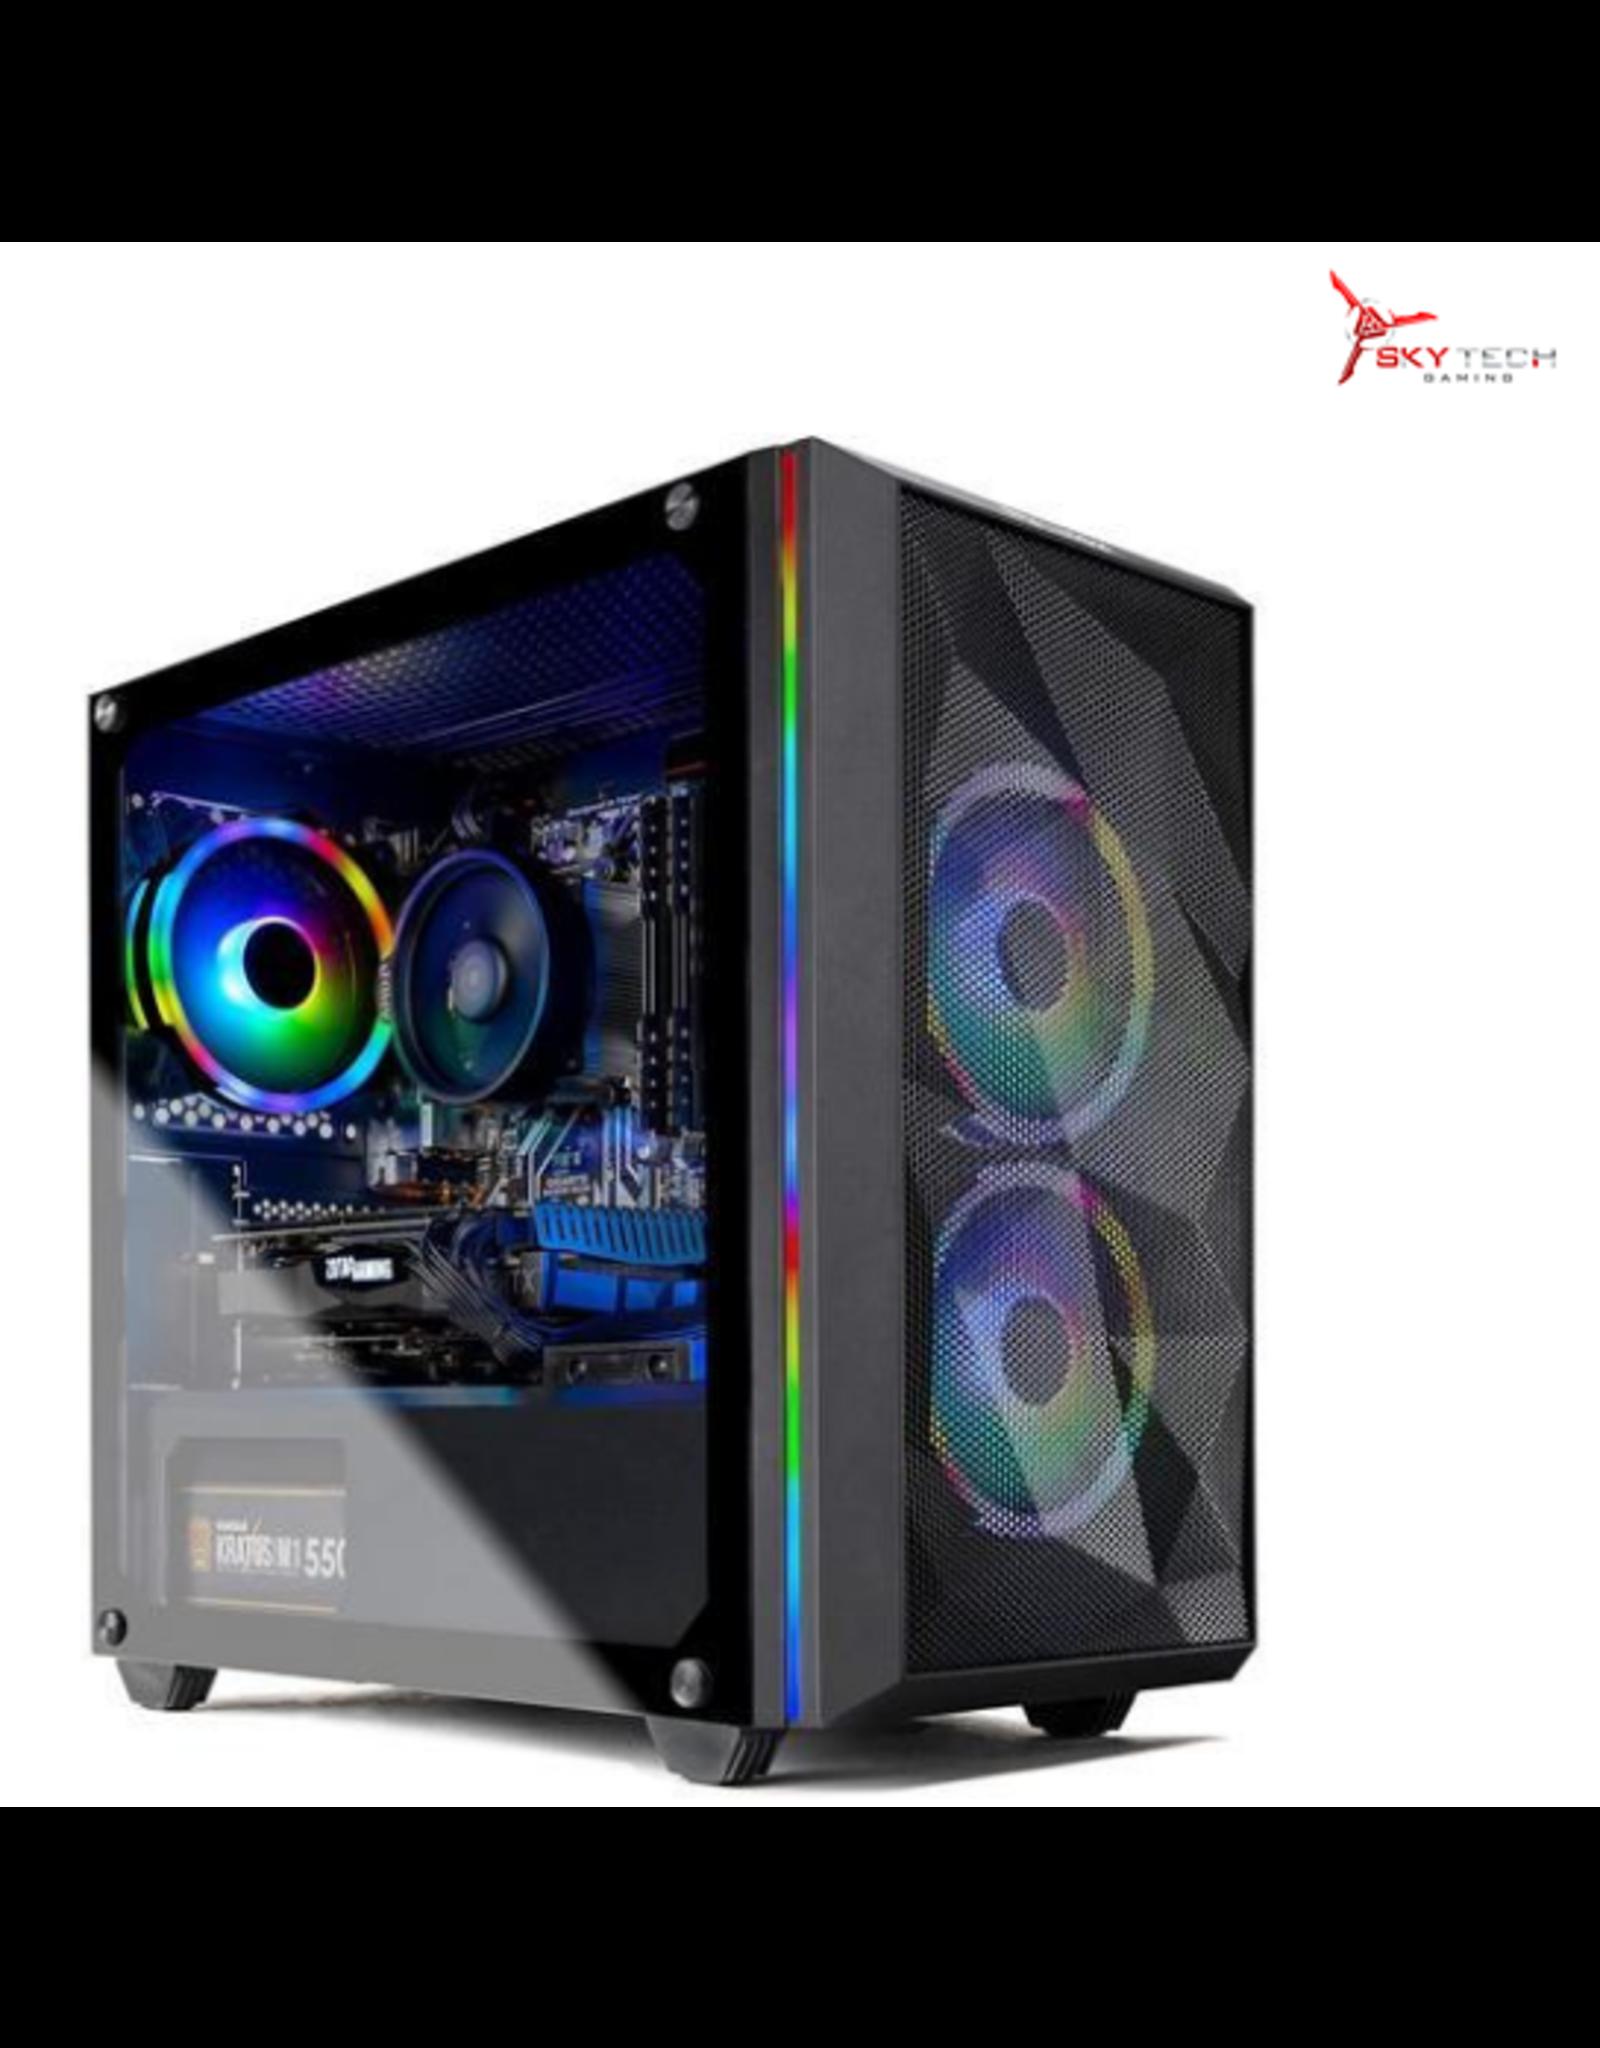 Skytech Gaming Desktop Chronos Mini